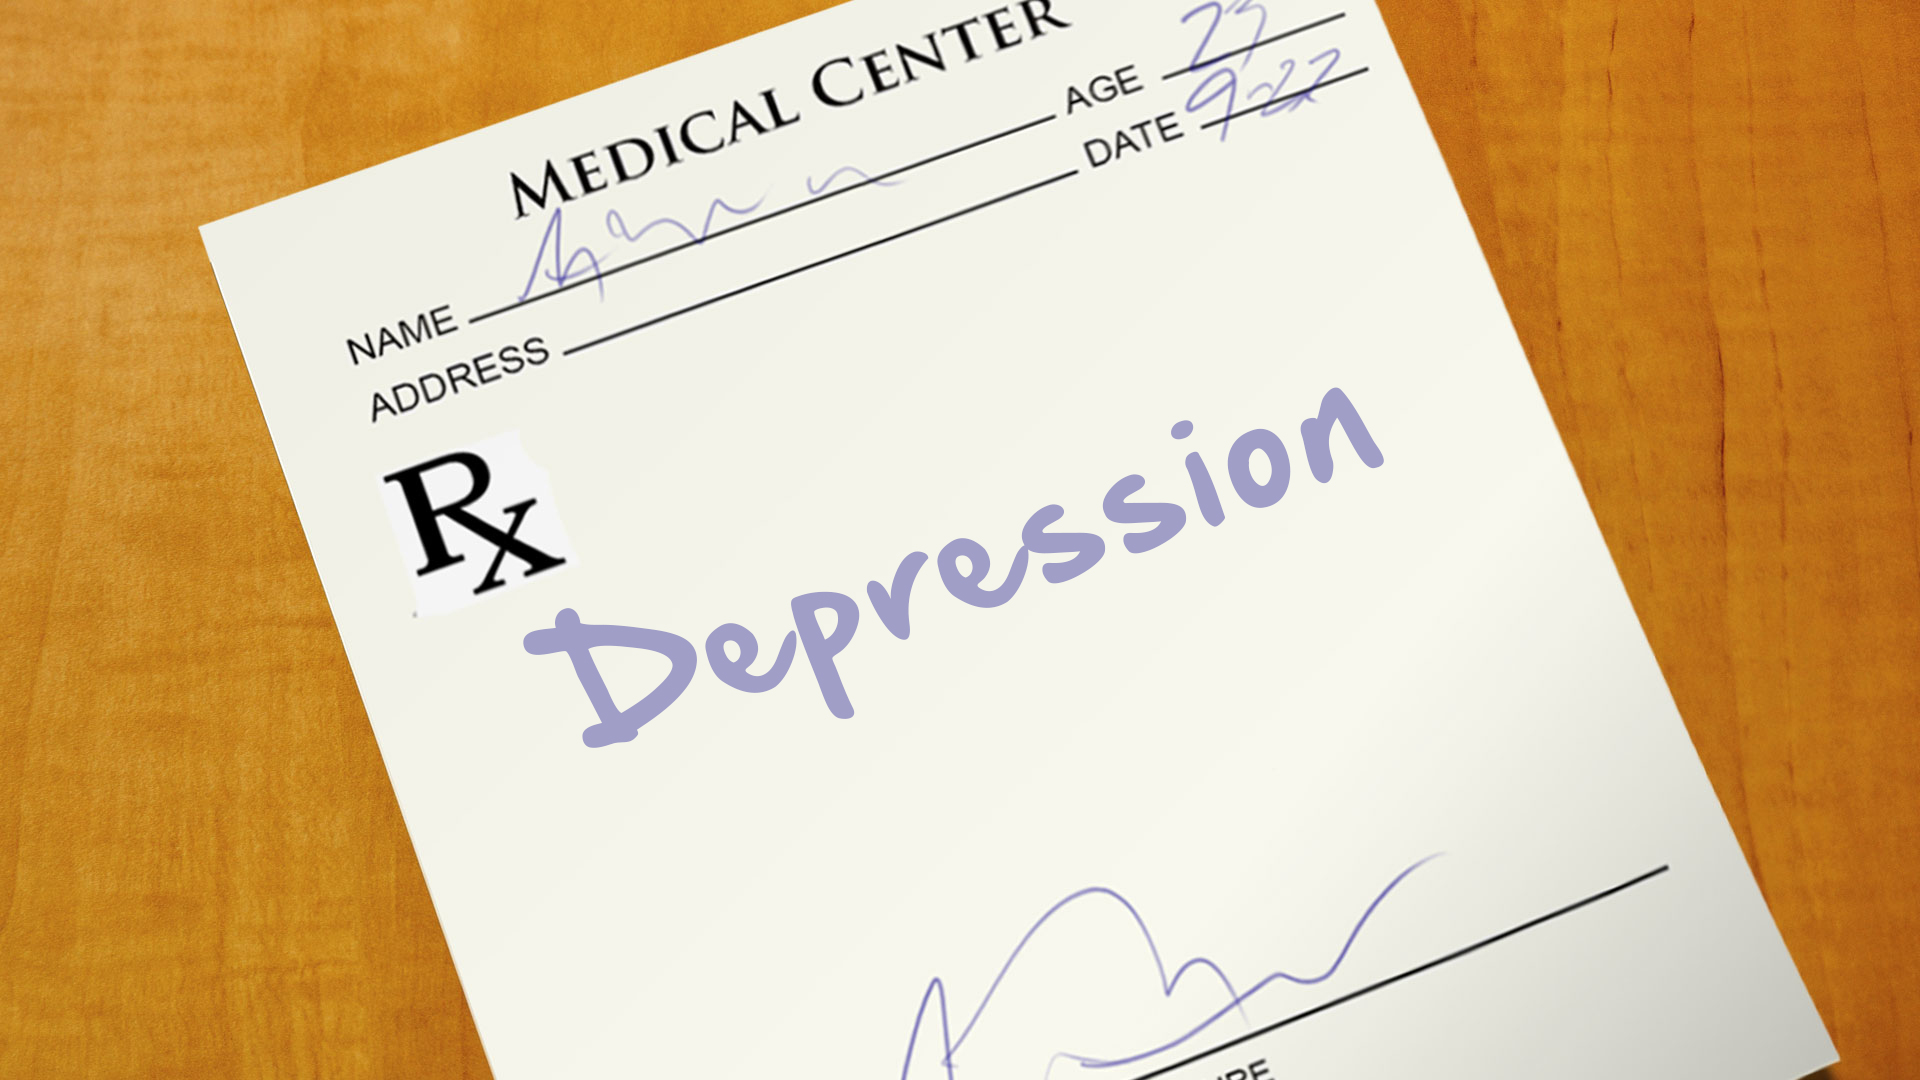 08.Depression Treatment Options - Medication